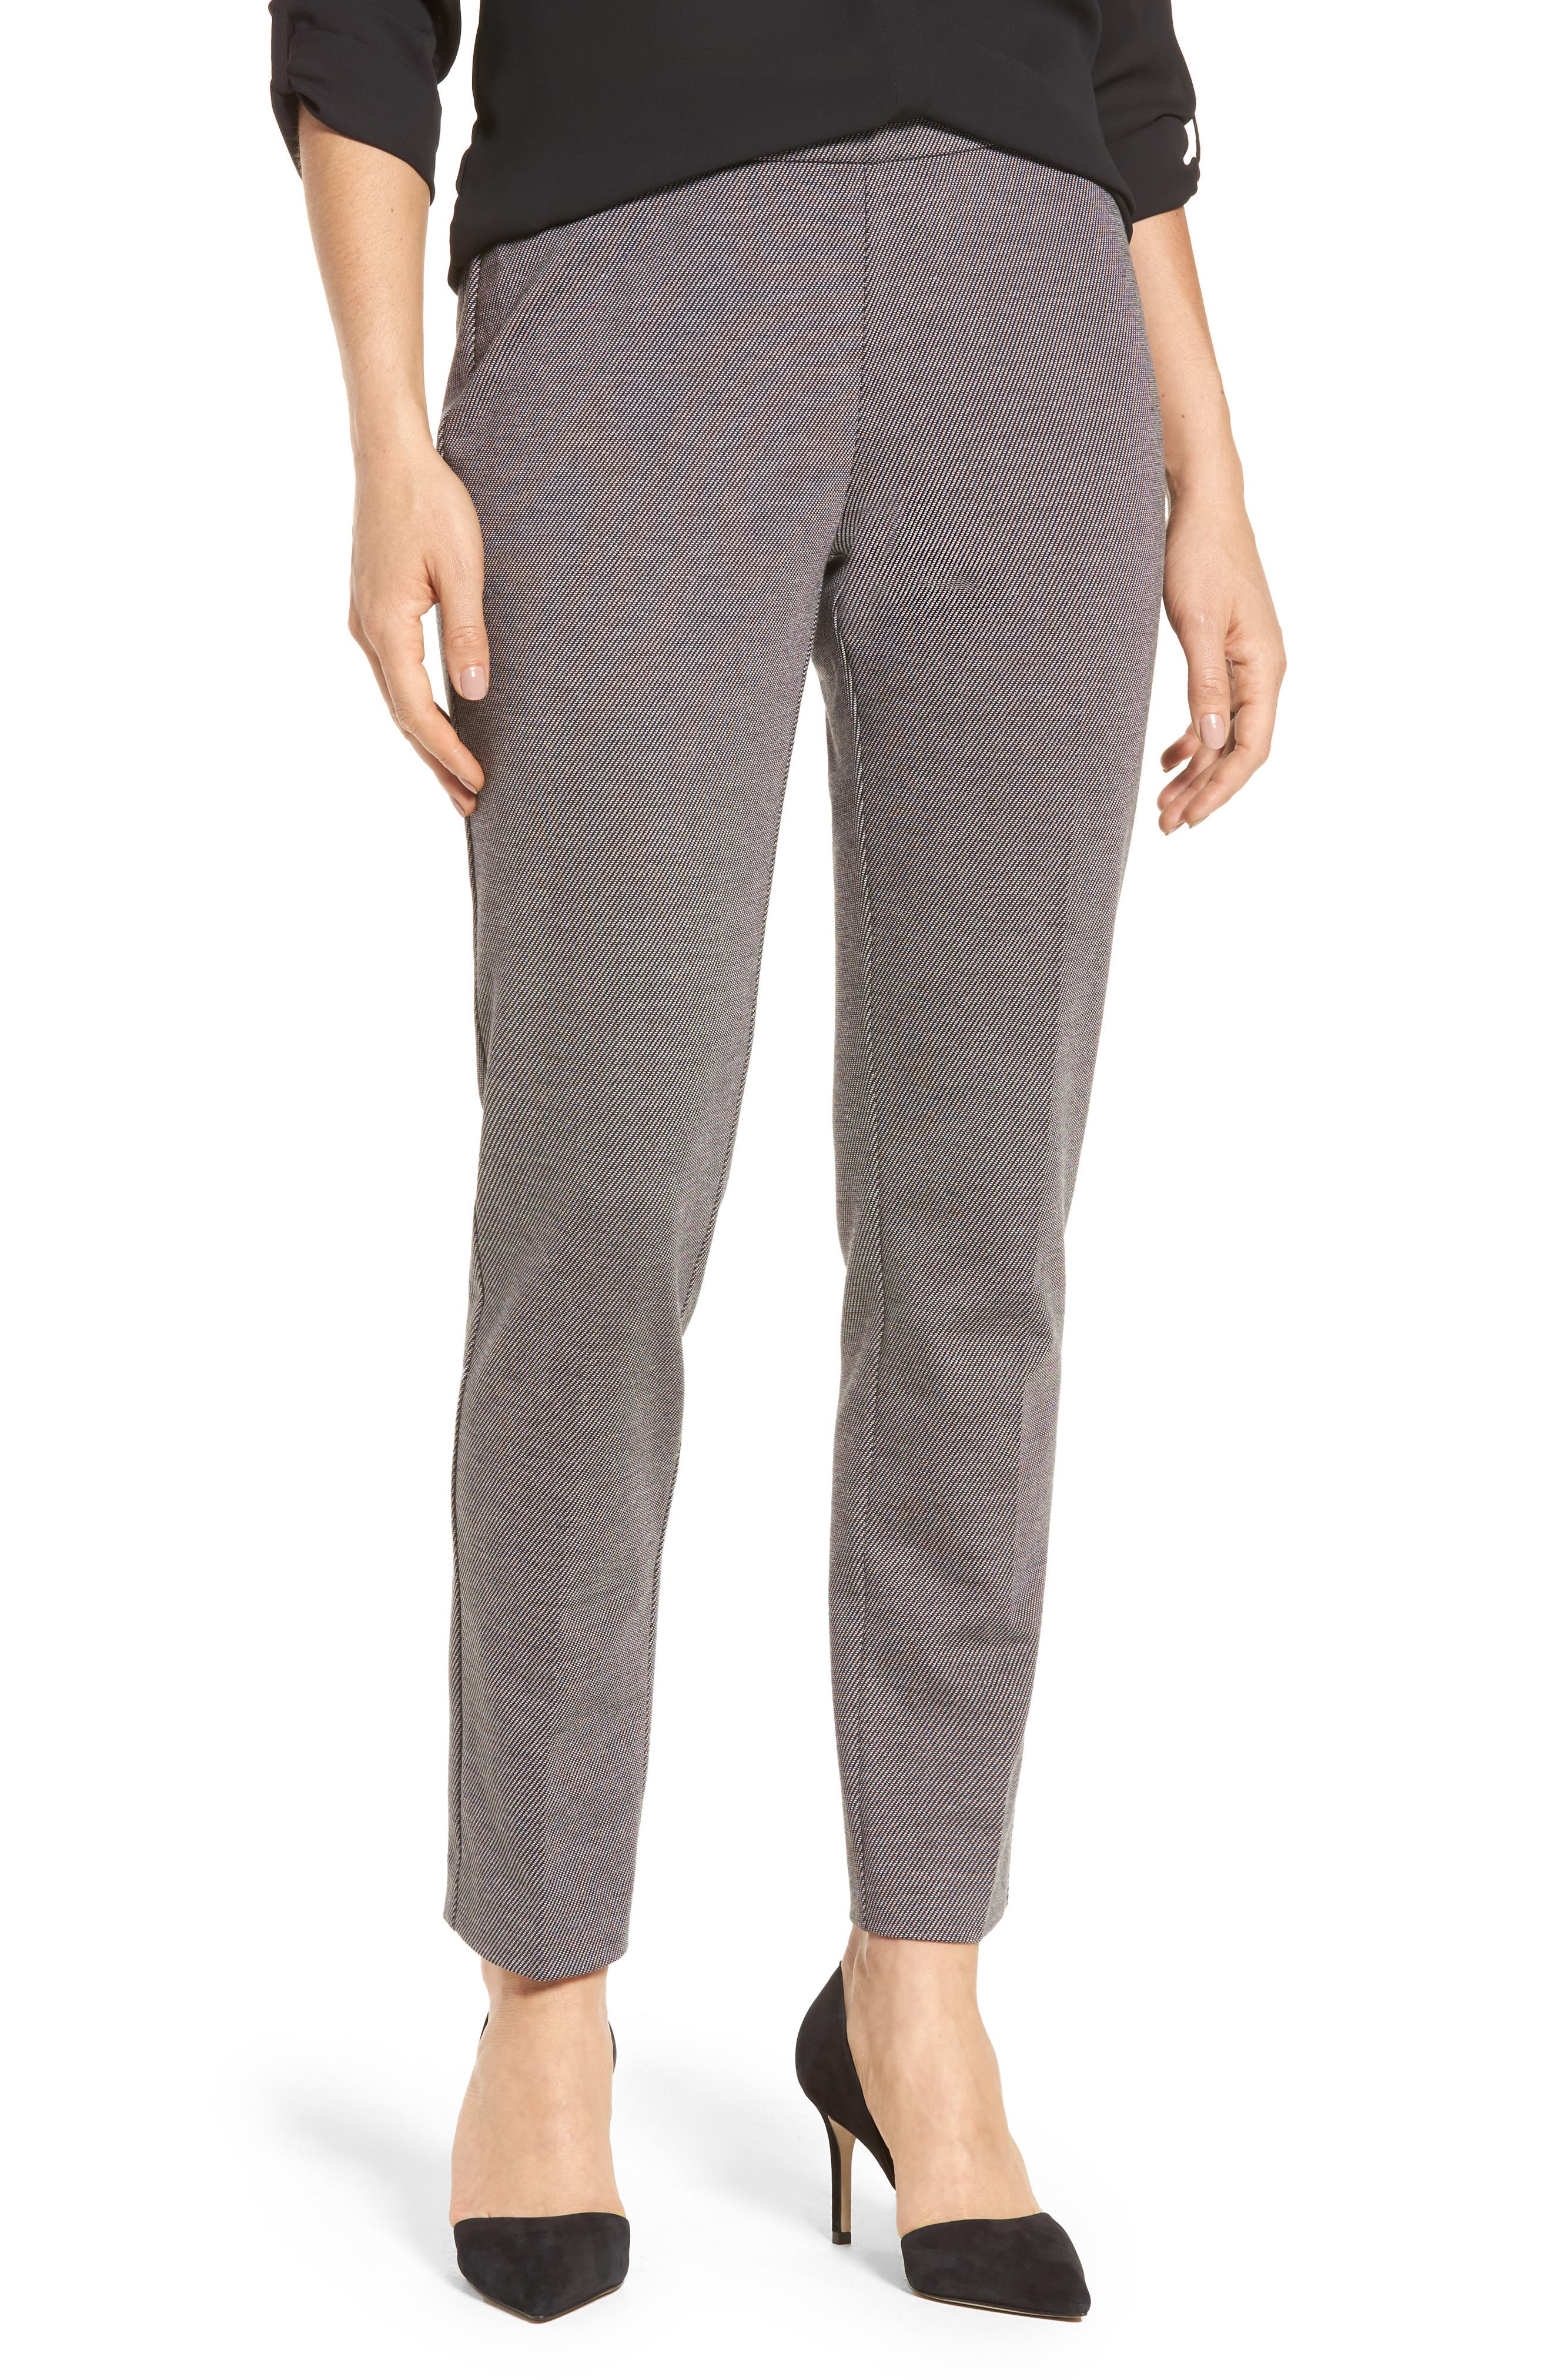 Alternate Image 1 Selected - Chaus Slim Twill Ponte Knit Pants